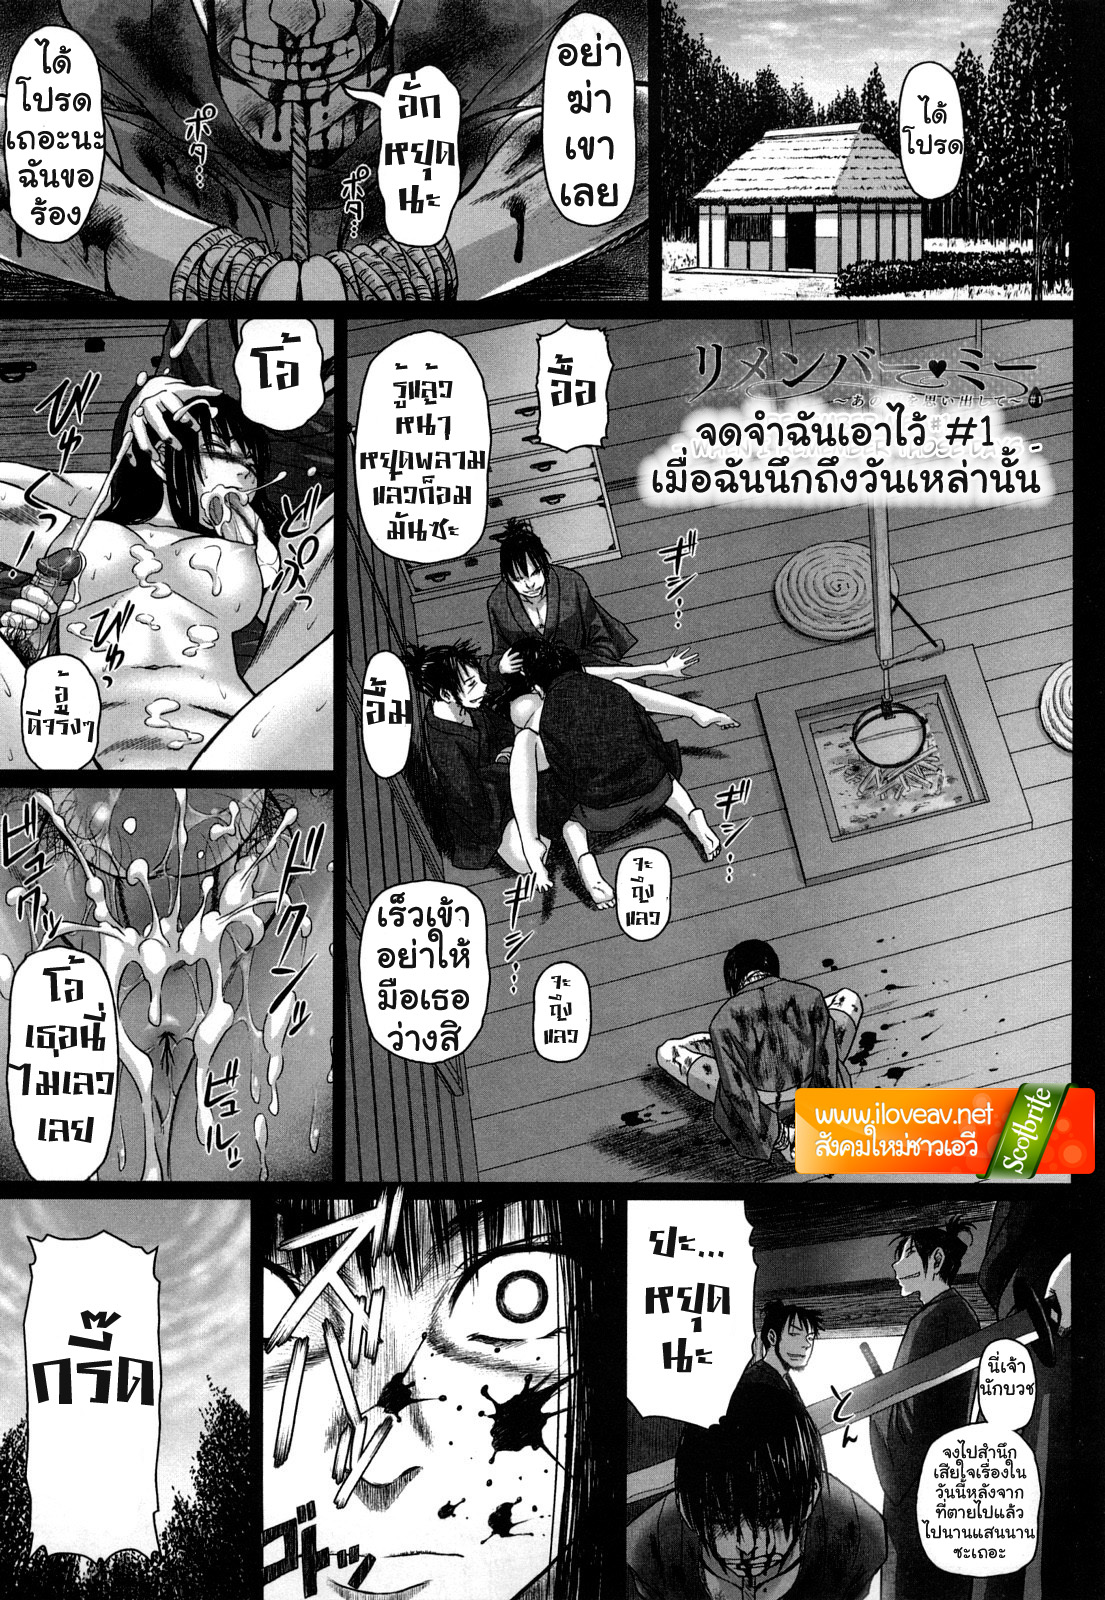 Remember ♡ Me [Thai ภาษาไทย] [Scootbrite]